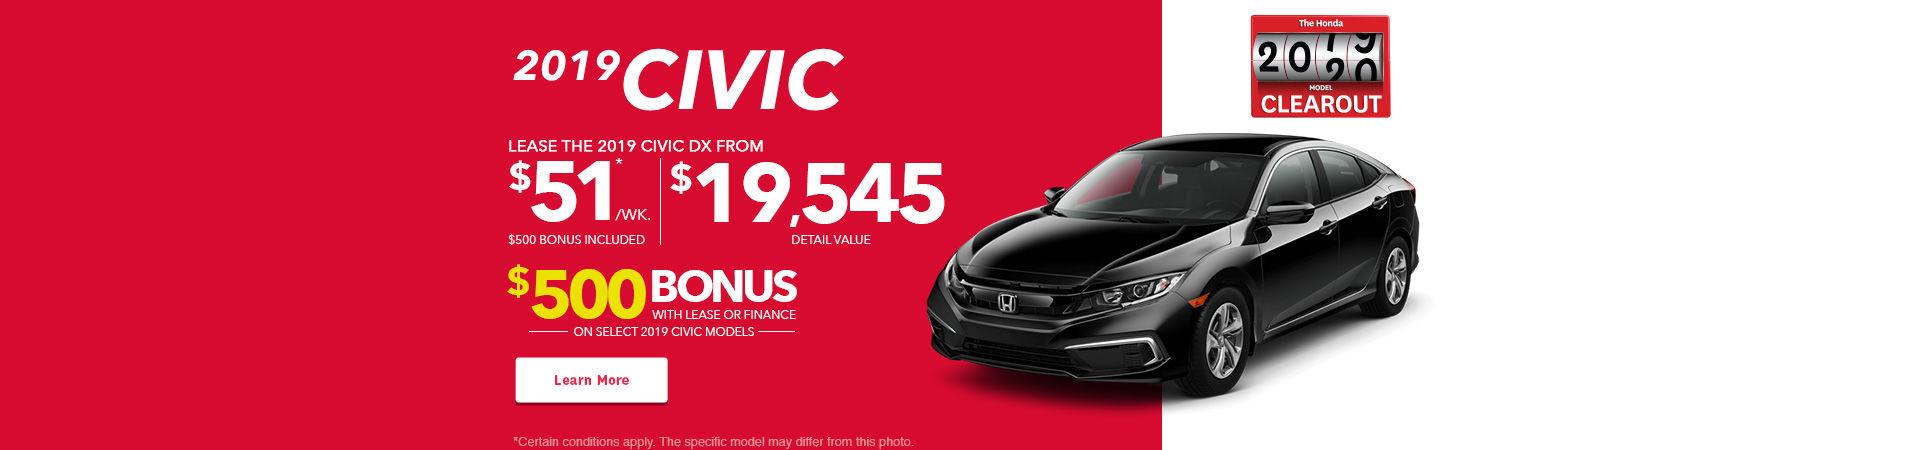 Honda Civic - Headers